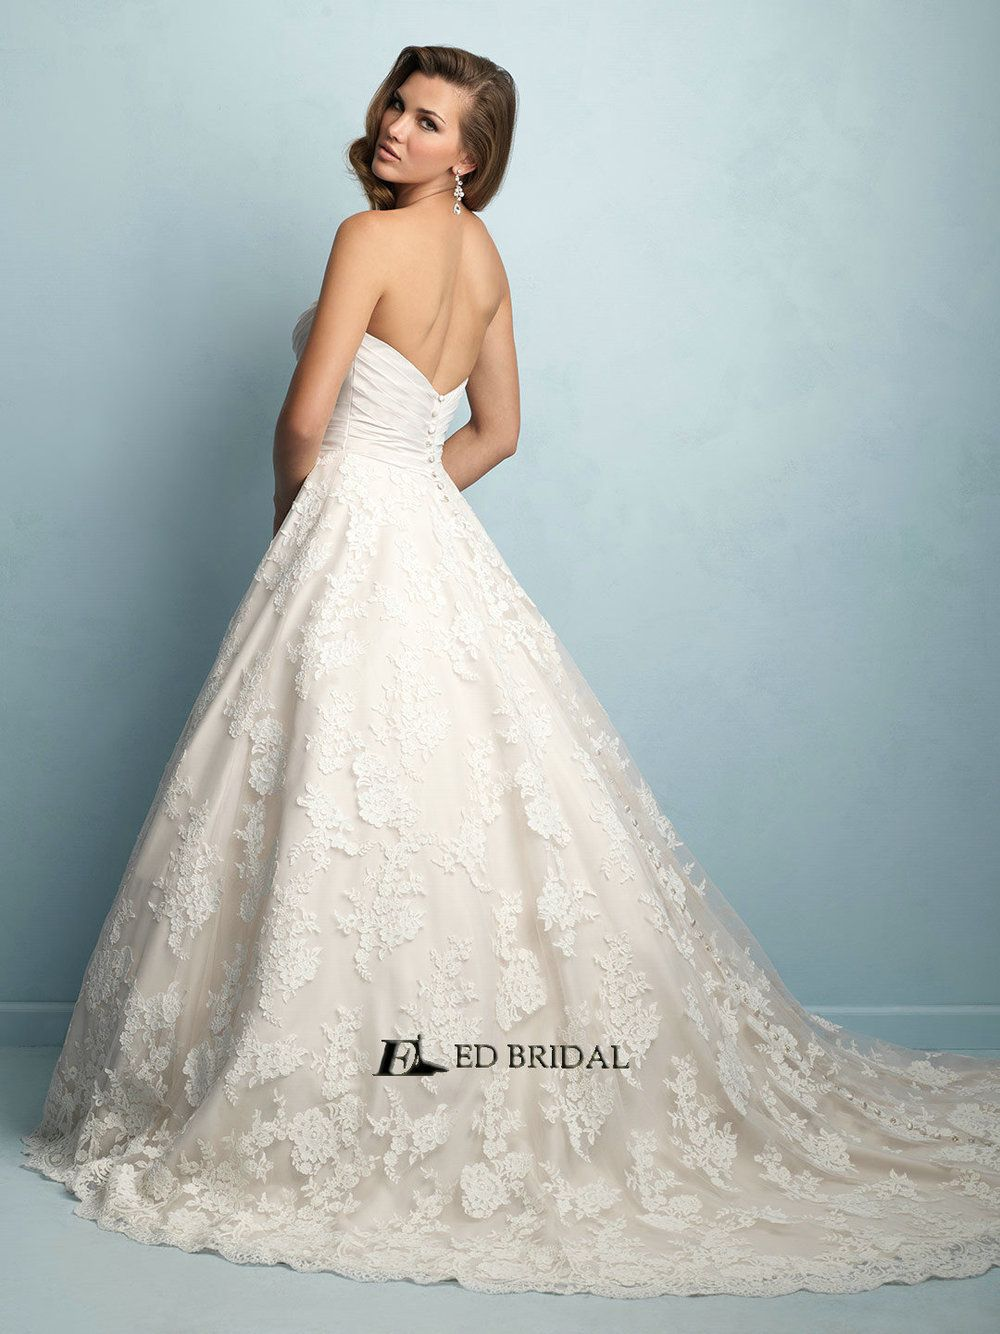 Ed Yh2260 Vestidos De Novias Lace Liqued Pleated Beaded Ball Gown Wedding Clothes View